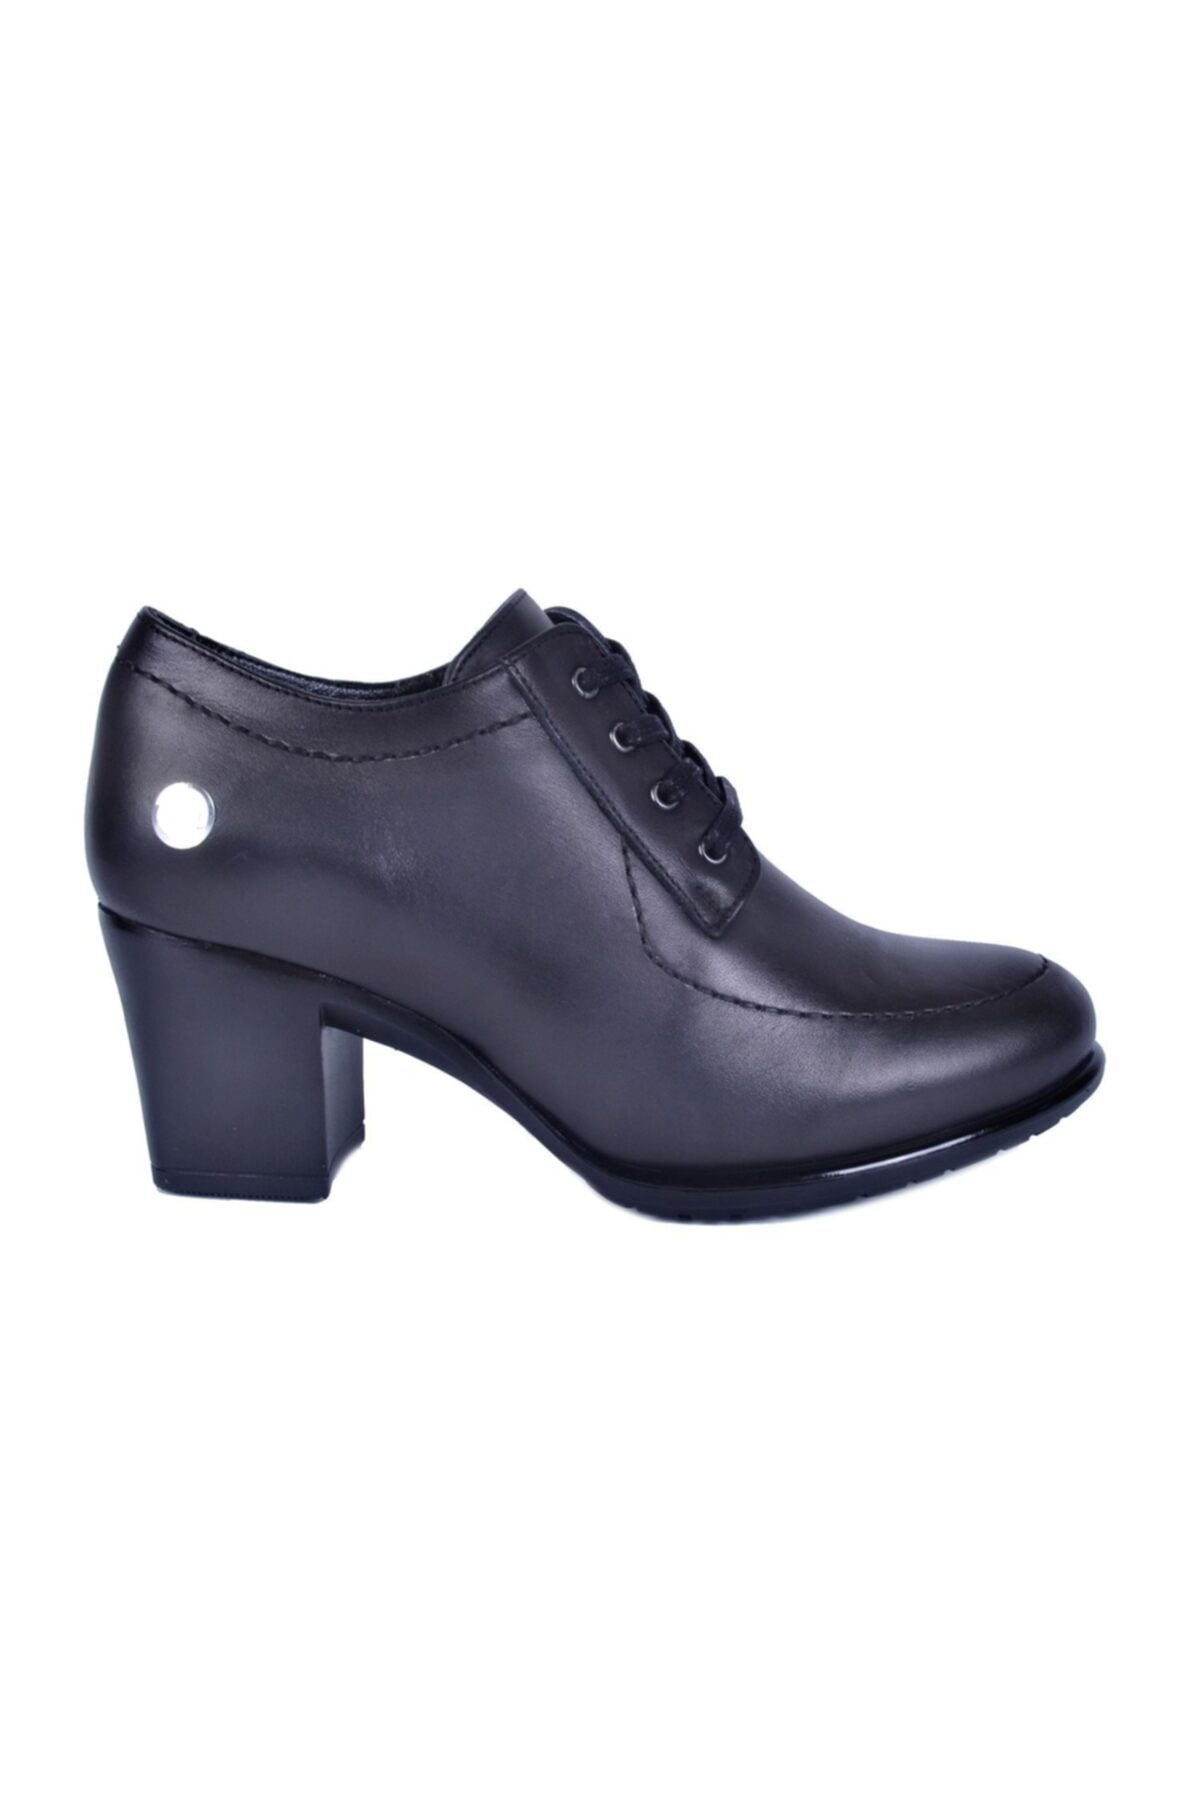 Mammamia Siyah Kadın Topuklu Deri Ayakkabı 740 1